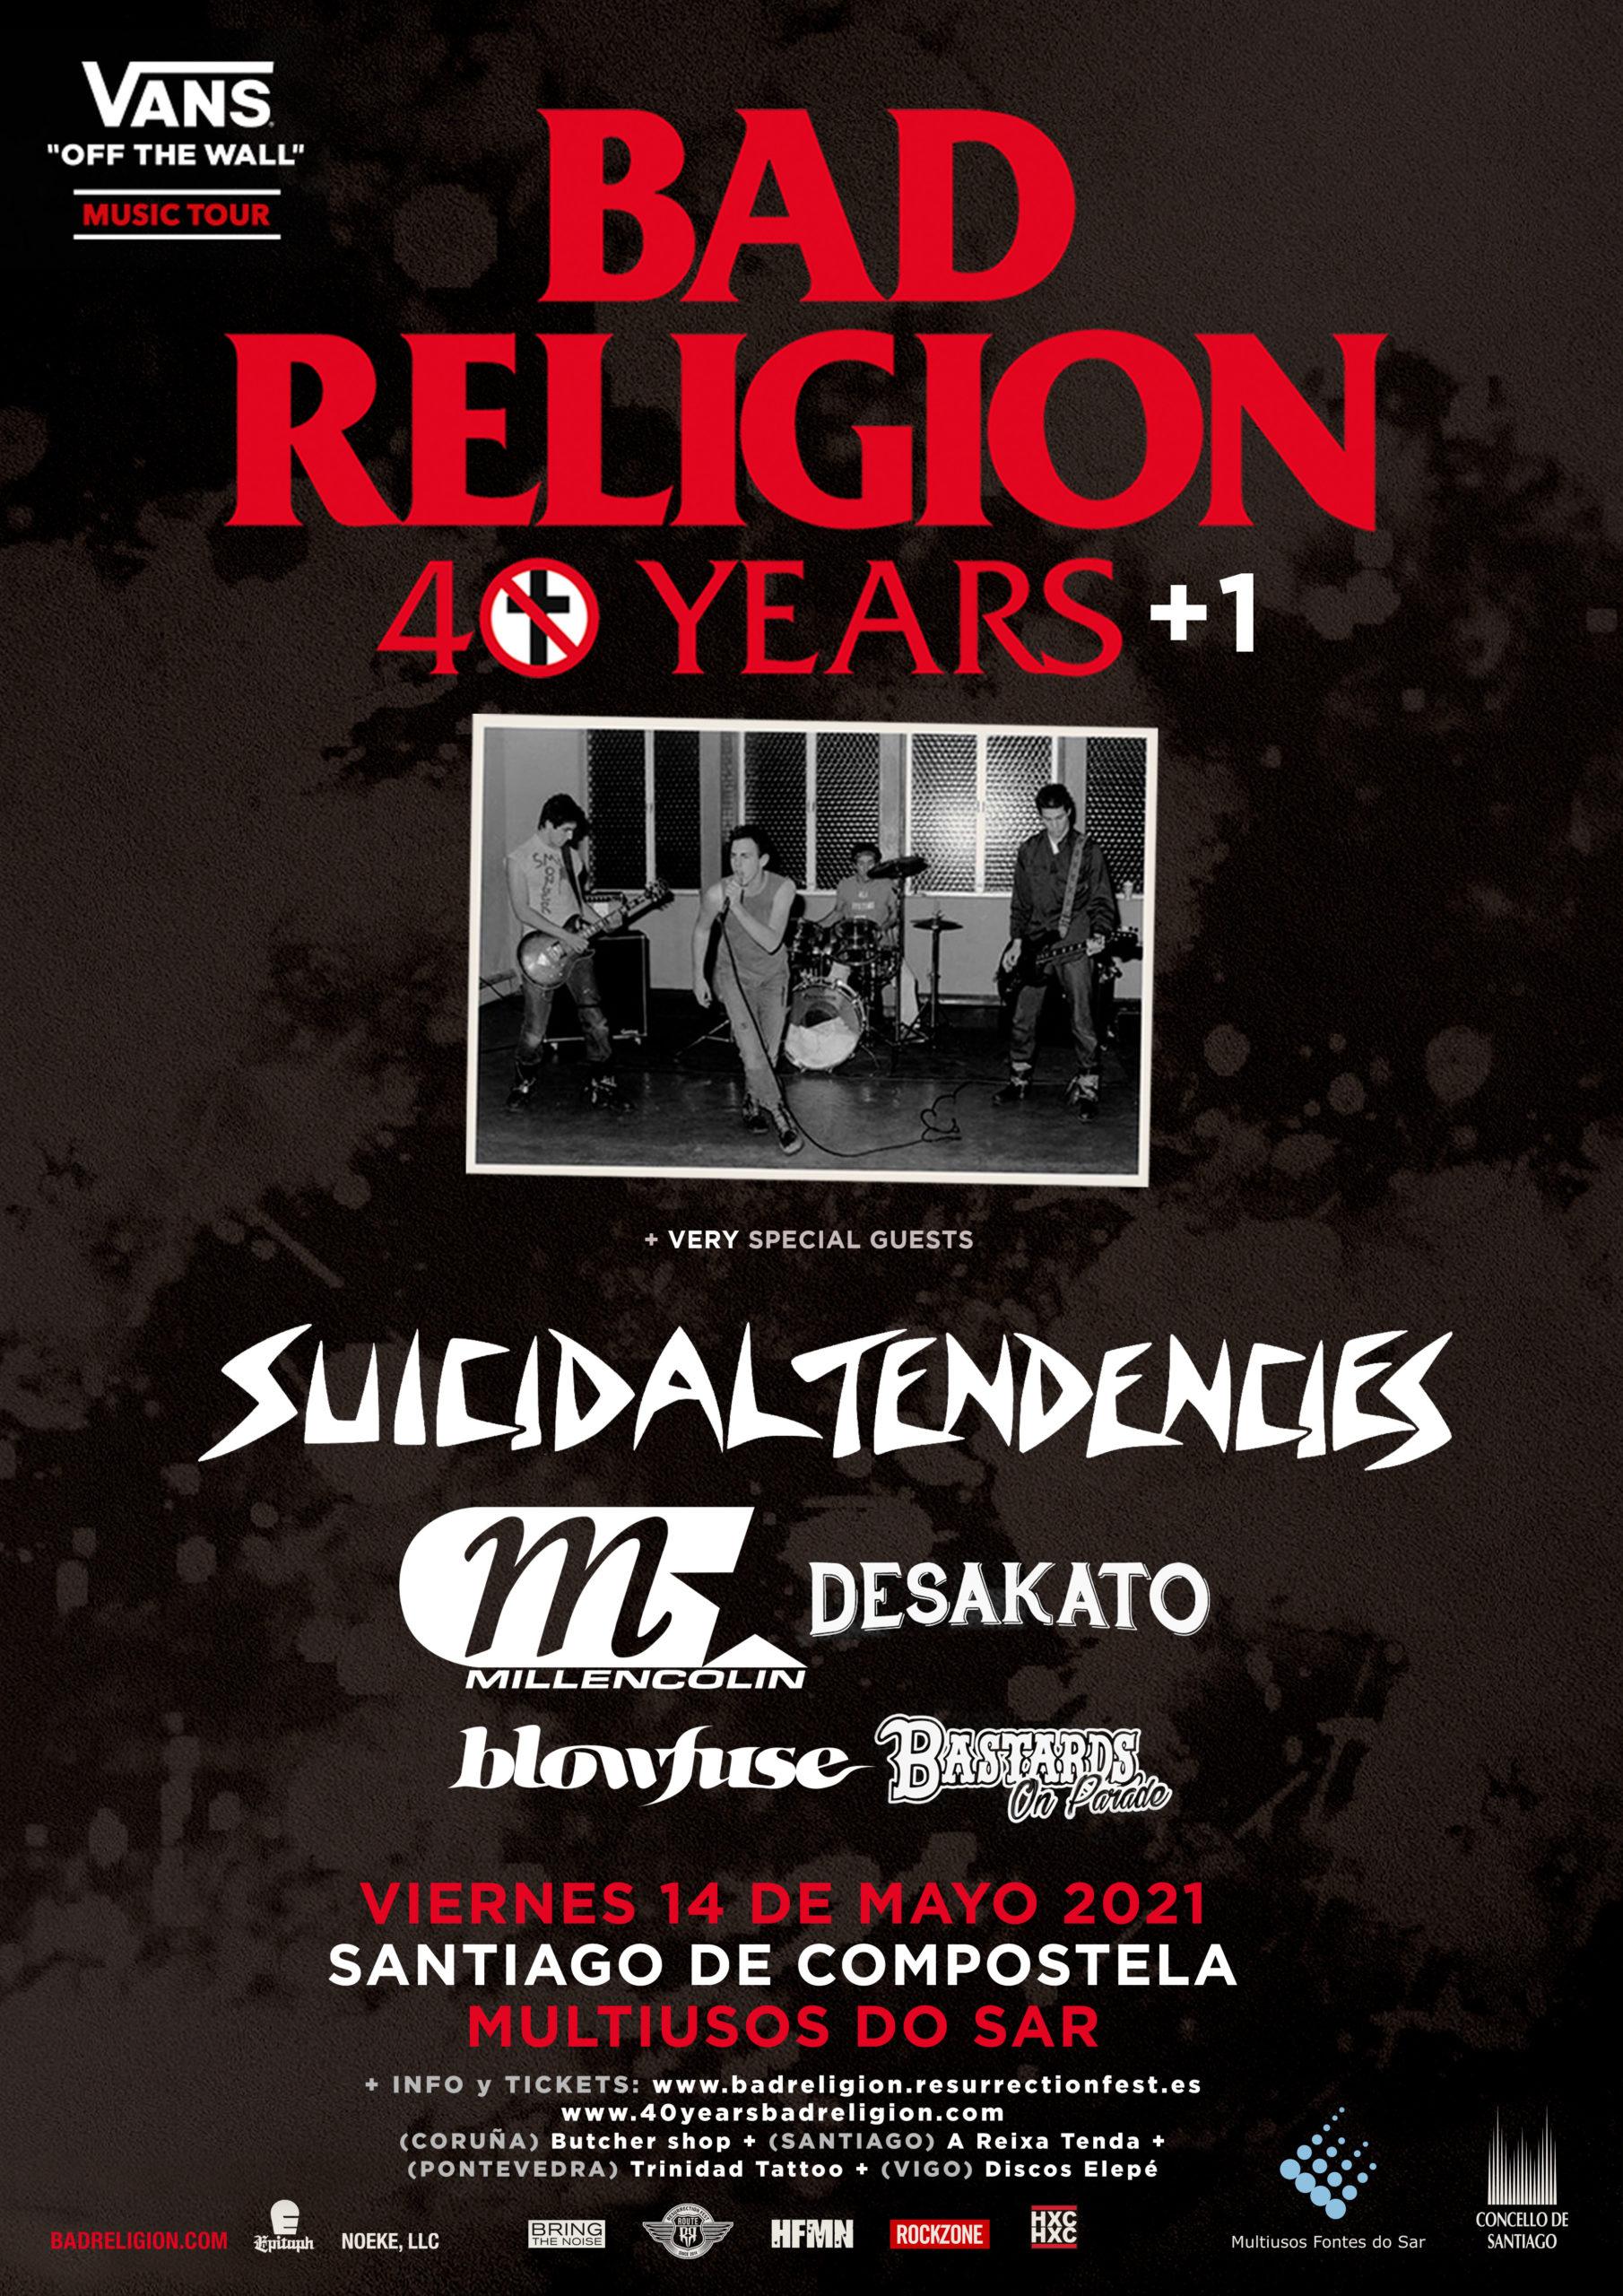 Route Resurrection 2021: Bad Religion – 40+1 Years (Santiago de Compostela)